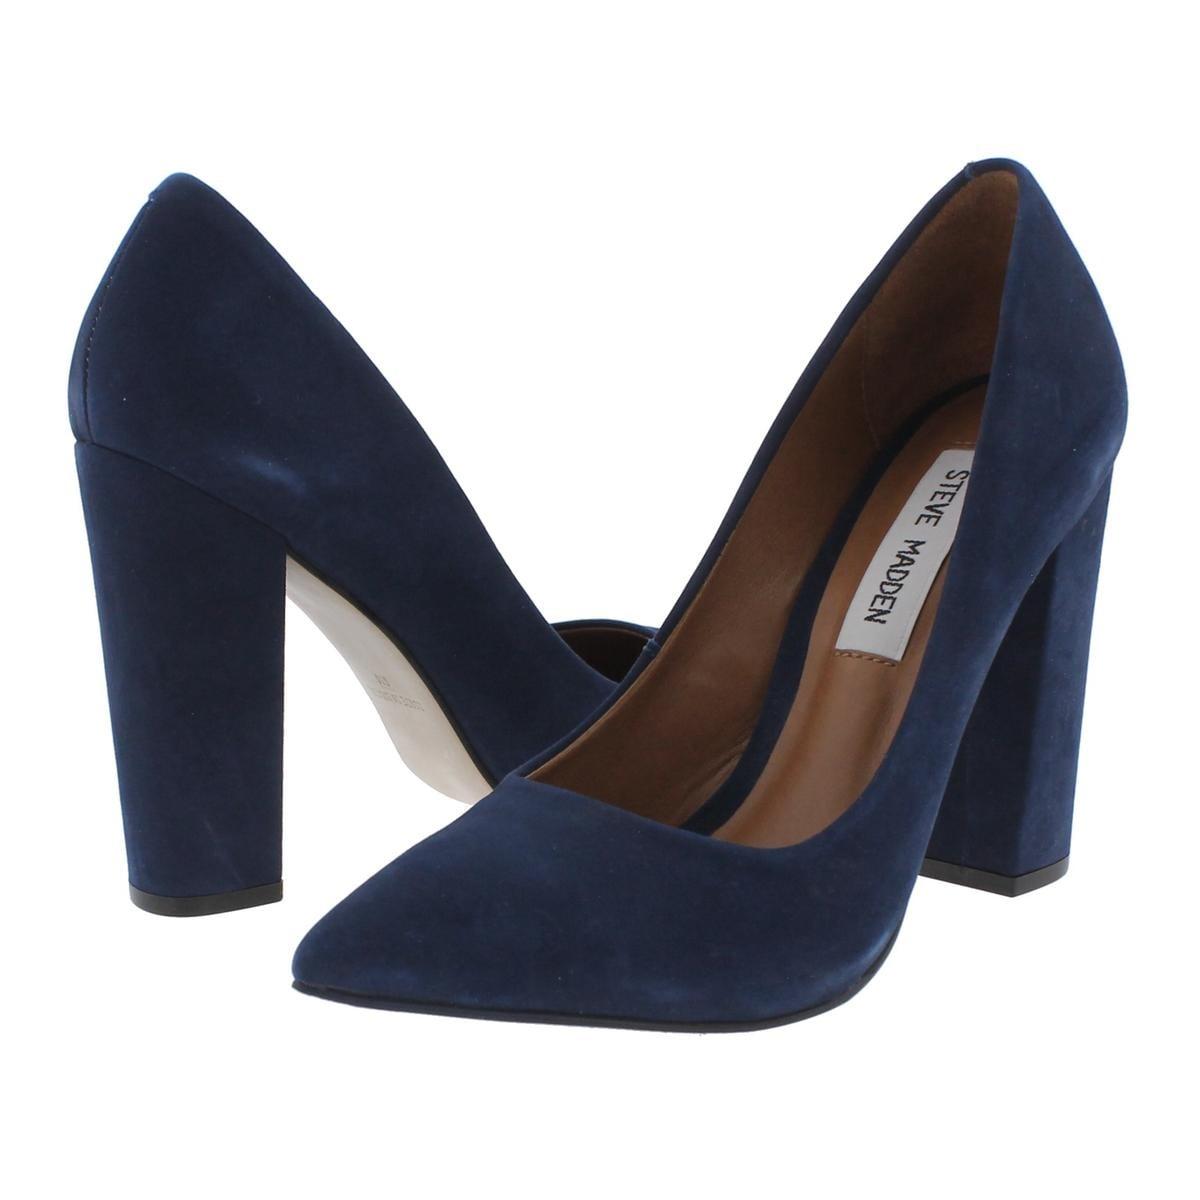 739107cf0a0 Shop Steve Madden Womens Primpy Dress Pumps Nubuck Block Heel - Free  Shipping Today - Overstock - 17430124